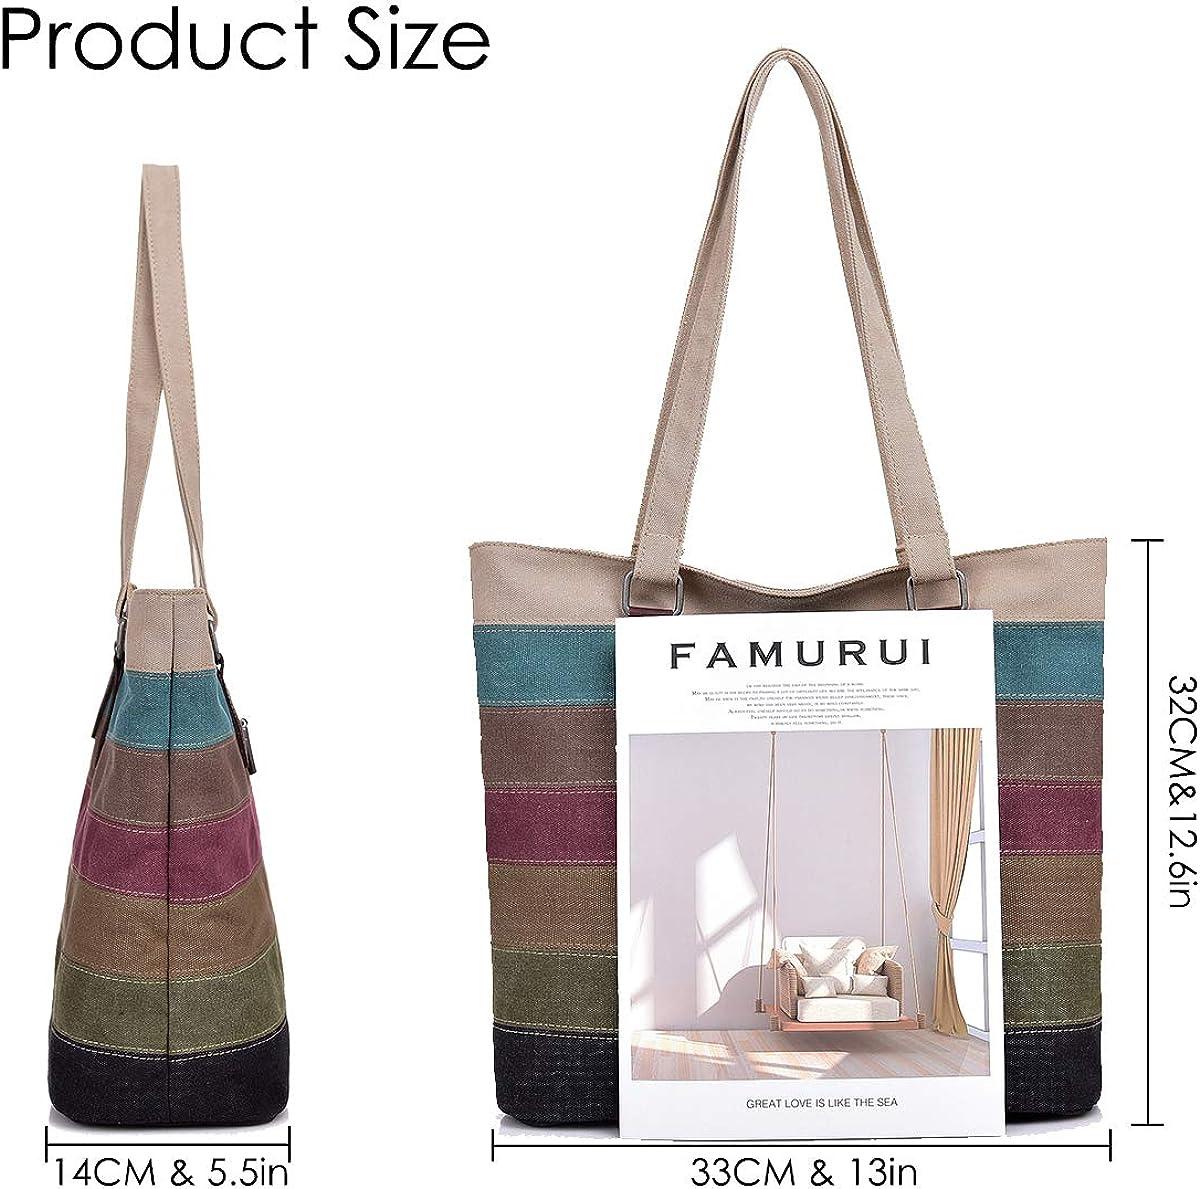 CHEREEKI Tote Bag Striped Canvas Womens Handbag for School Work Shopping and Travel